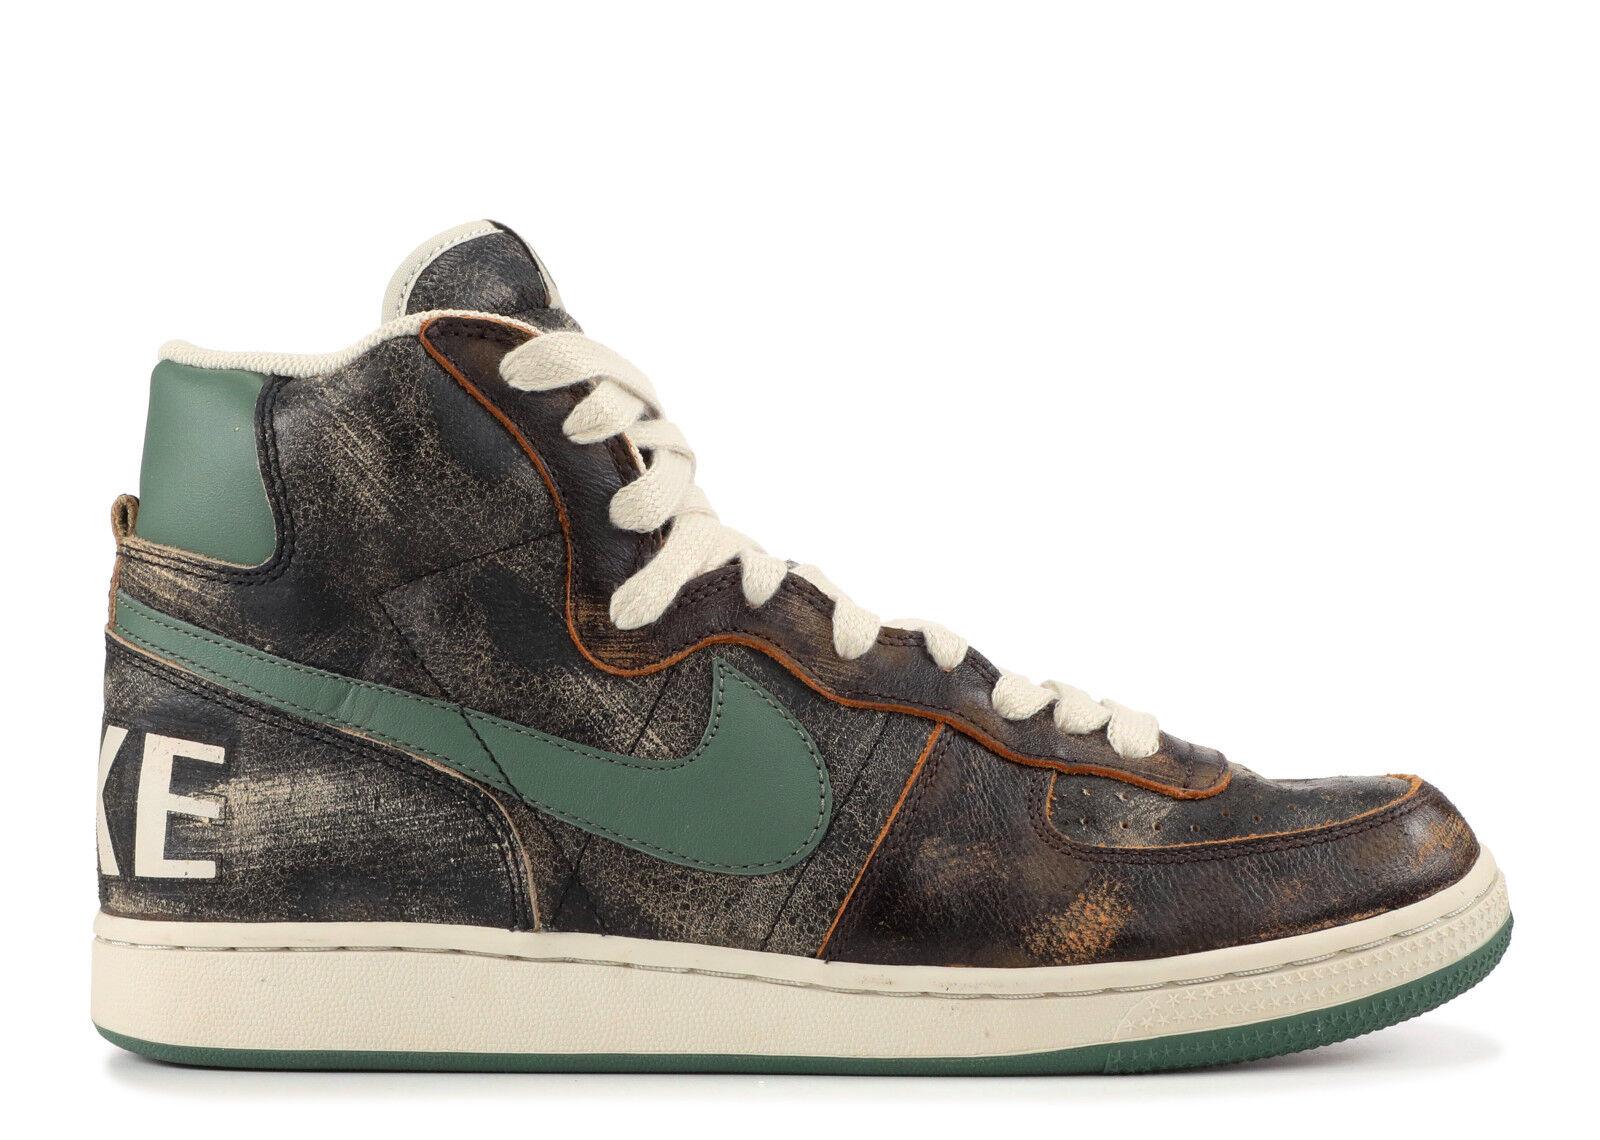 Nike Terminator Hi Premium, Black Nori-Dark Brown-Net Sz. 11.5 [Sty ]